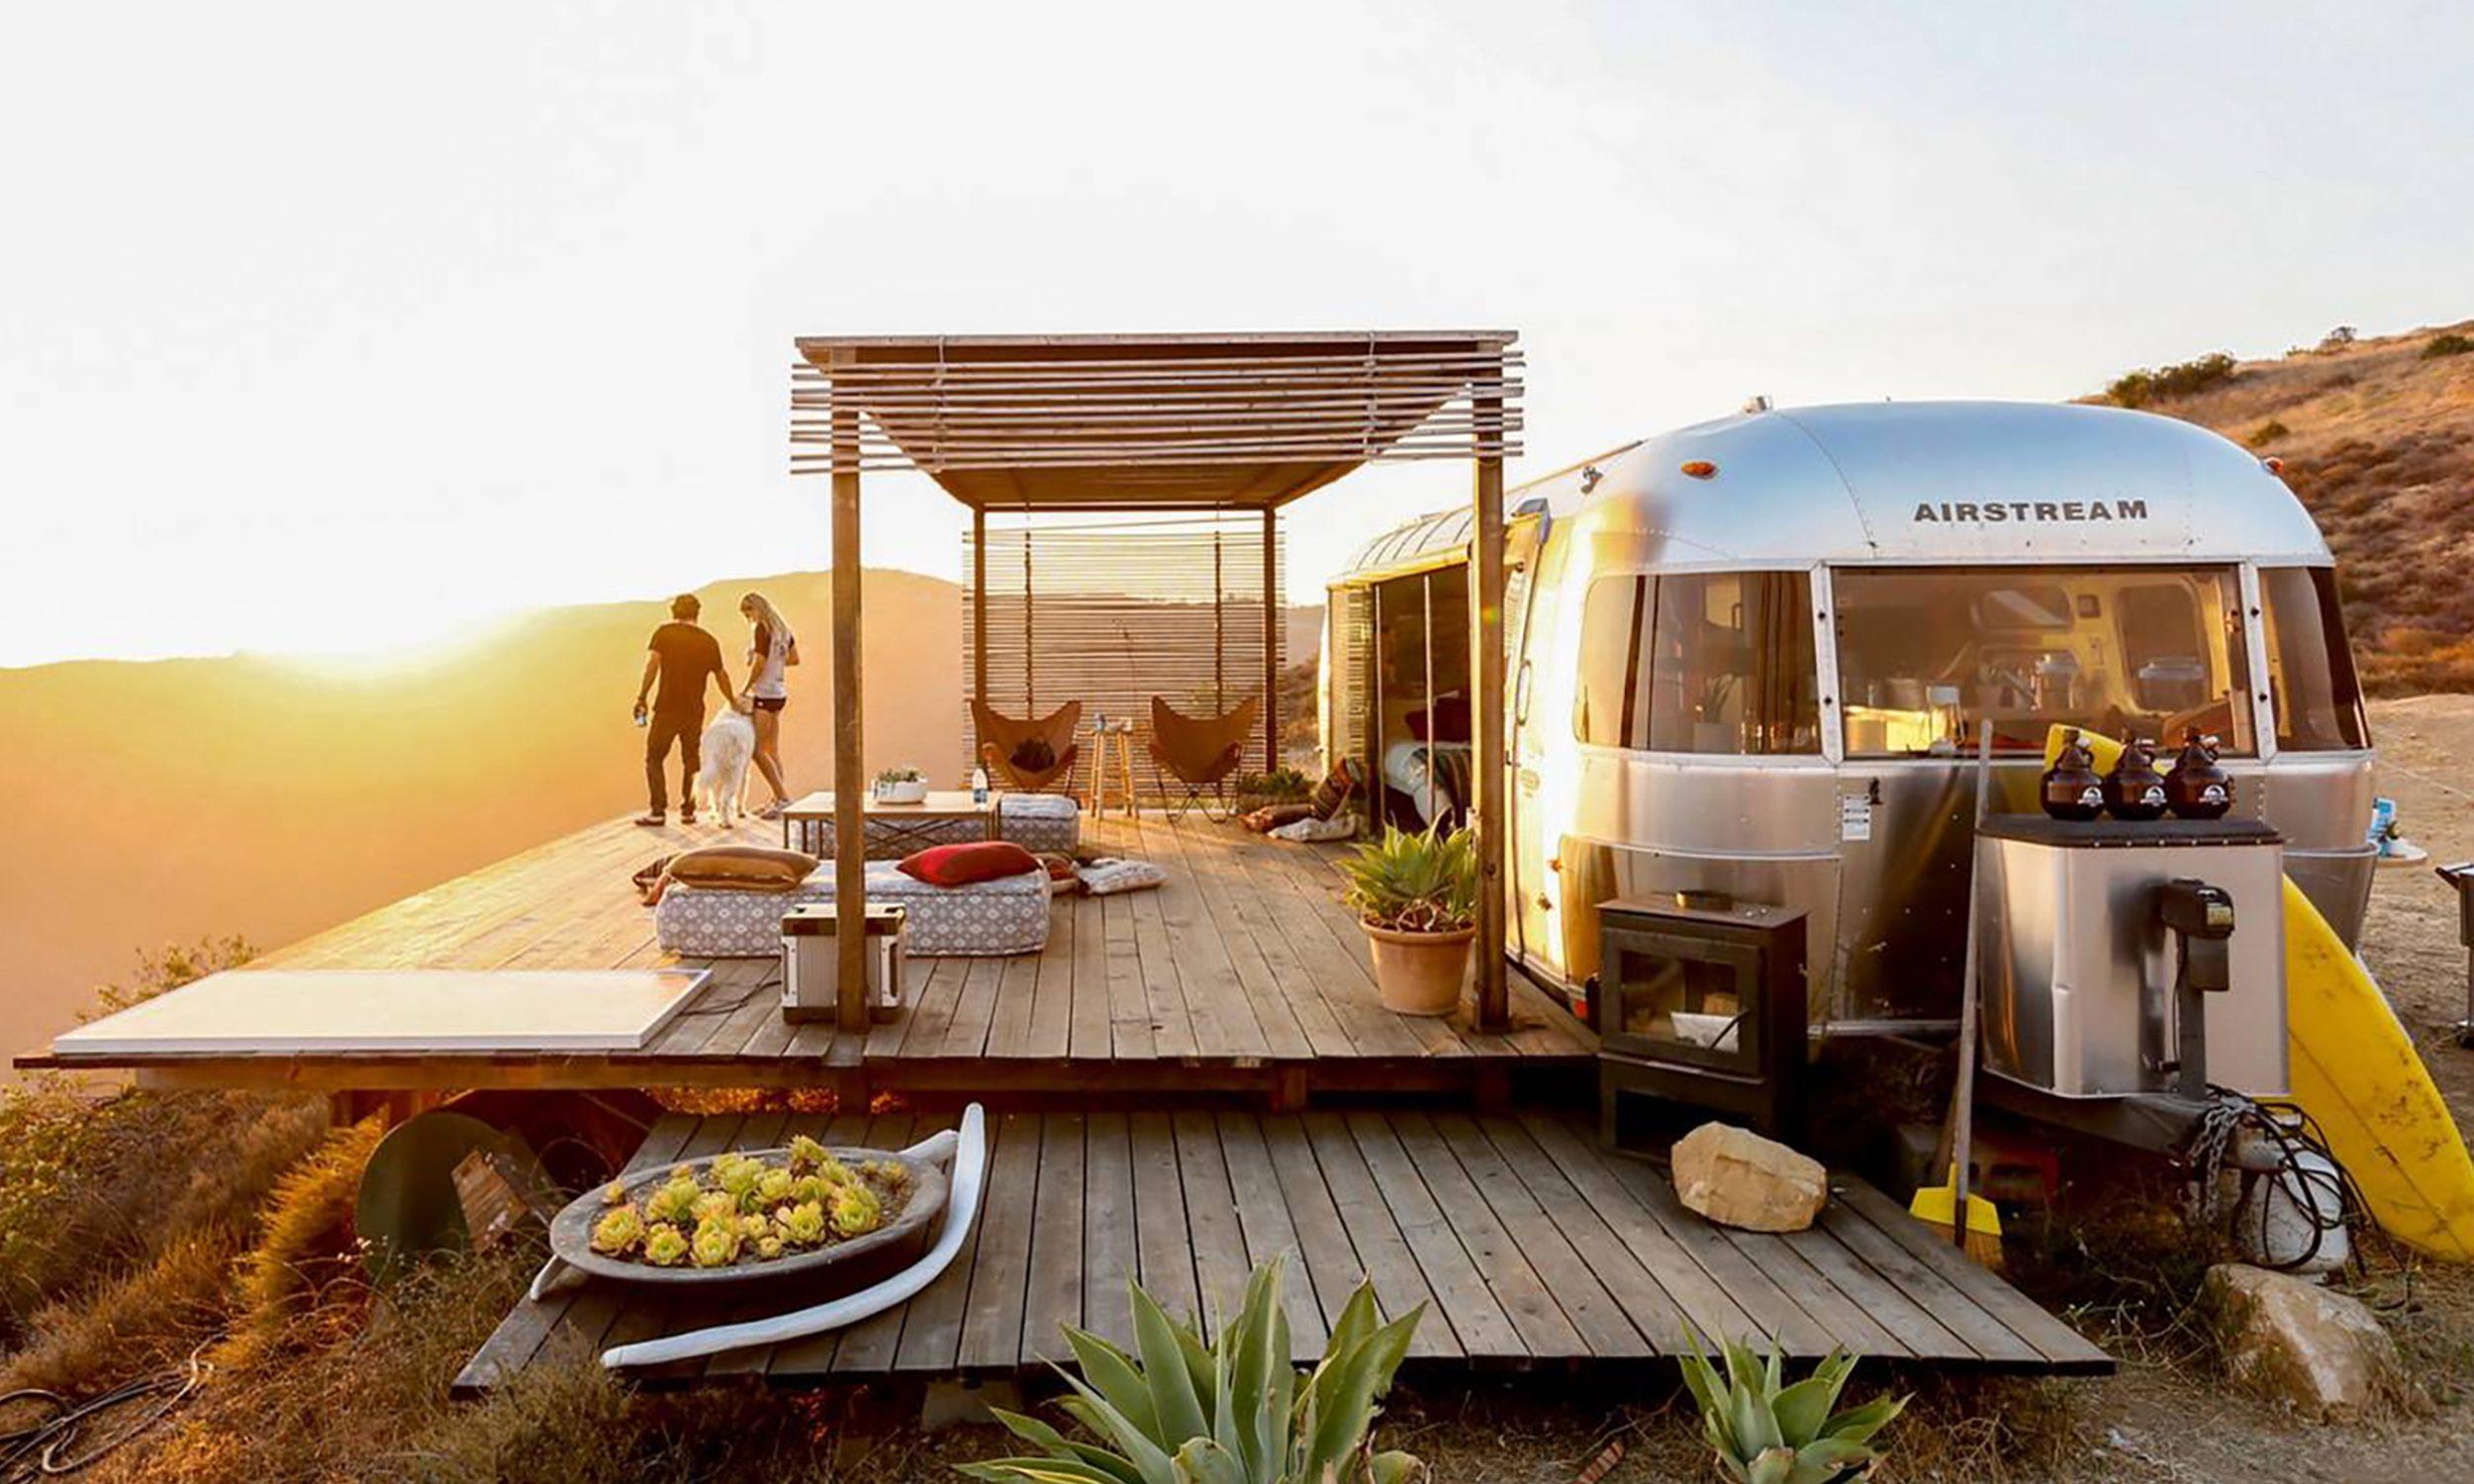 airbnb airstream